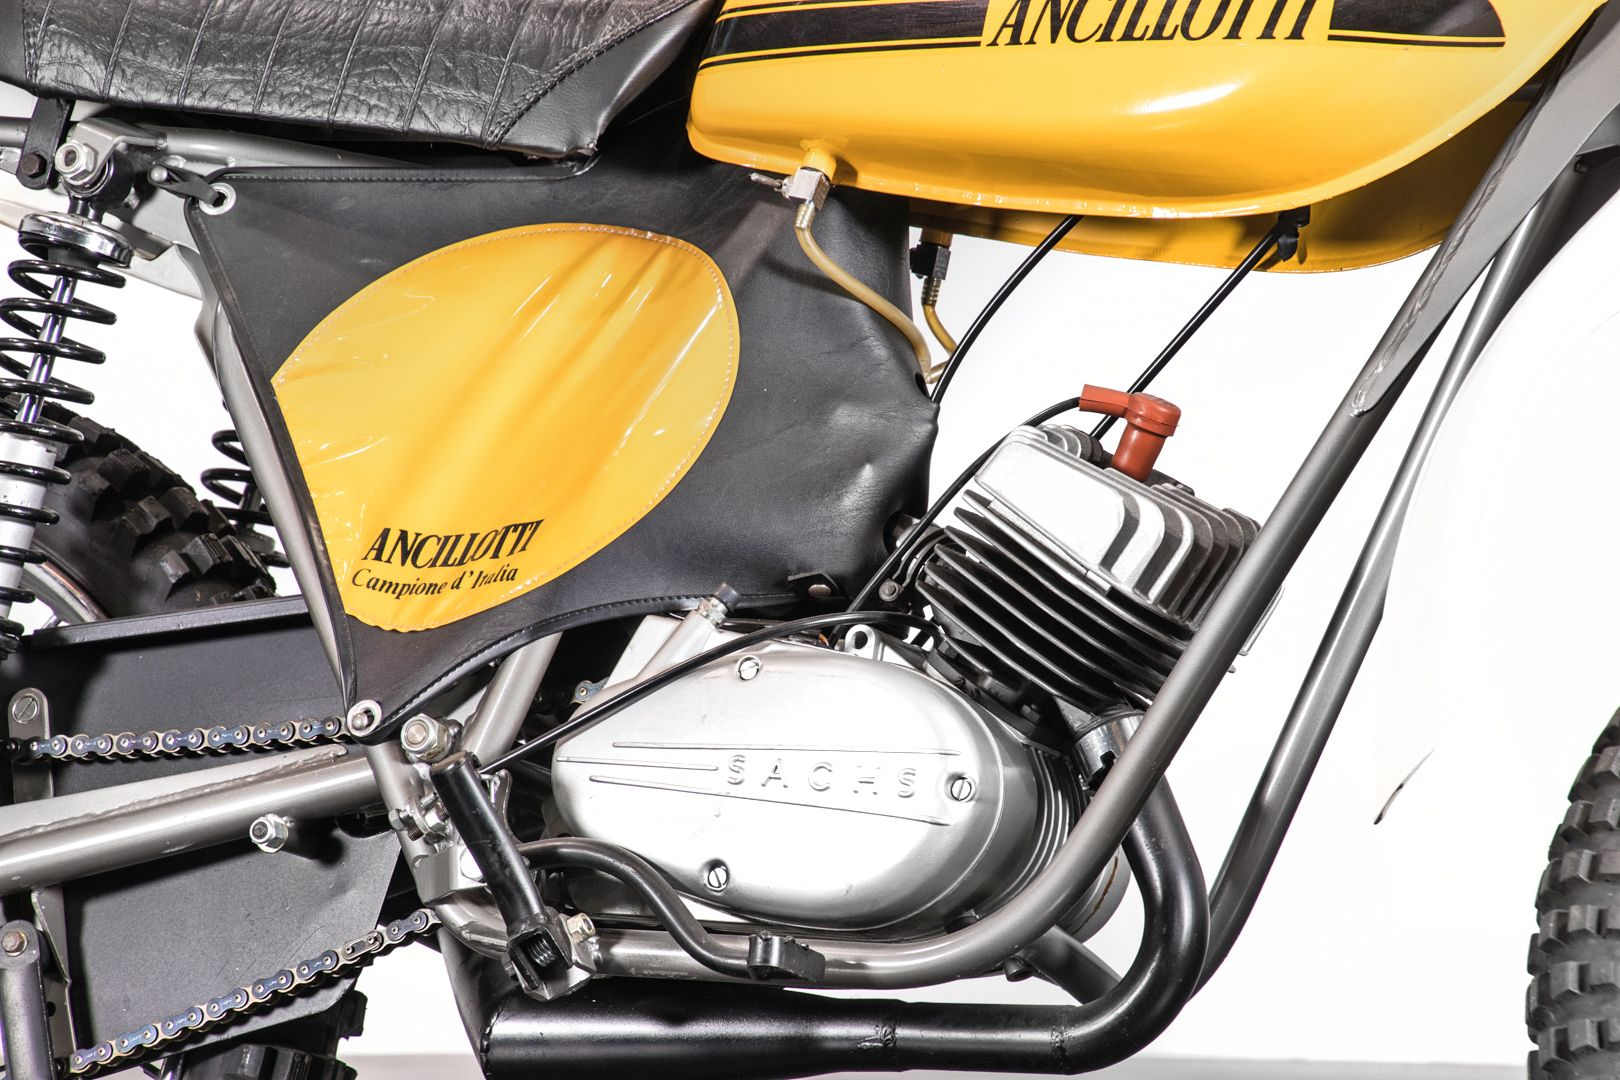 1973 Ancillotti Scarabeo 40968